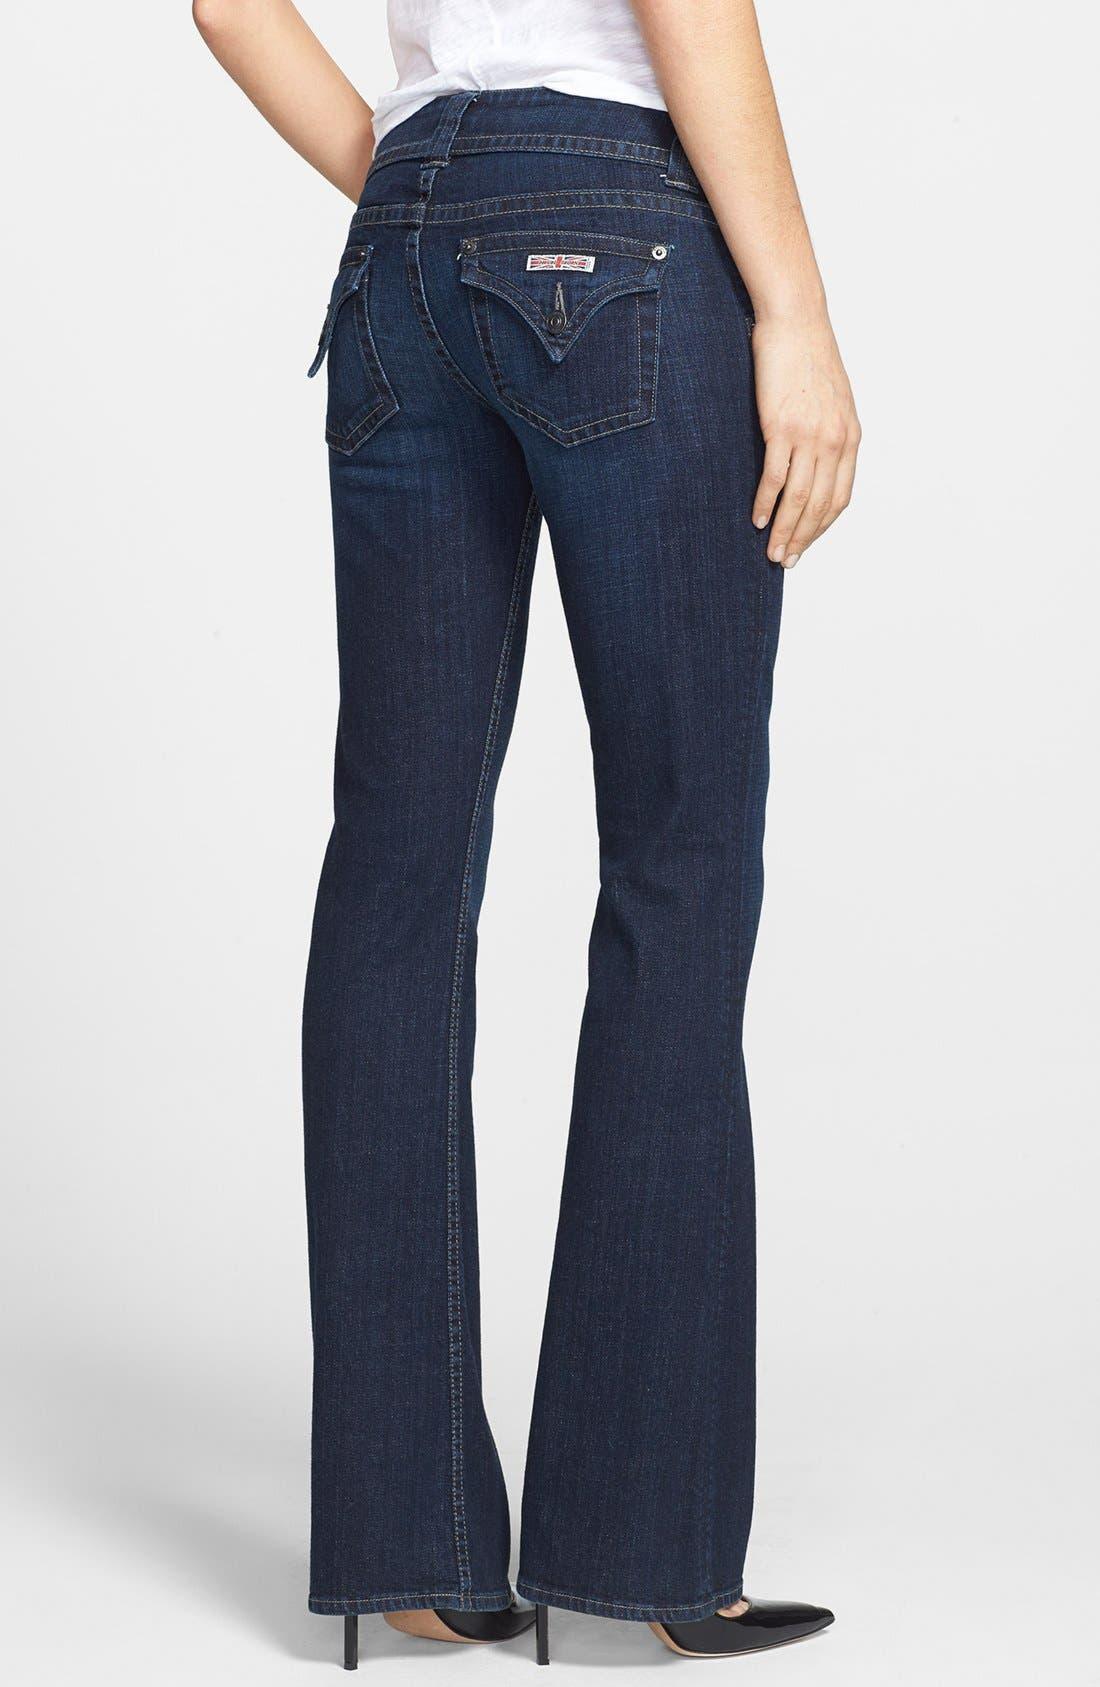 Alternate Image 2  - Hudson Jeans 'Signature' Bootcut Jeans (Charisma)